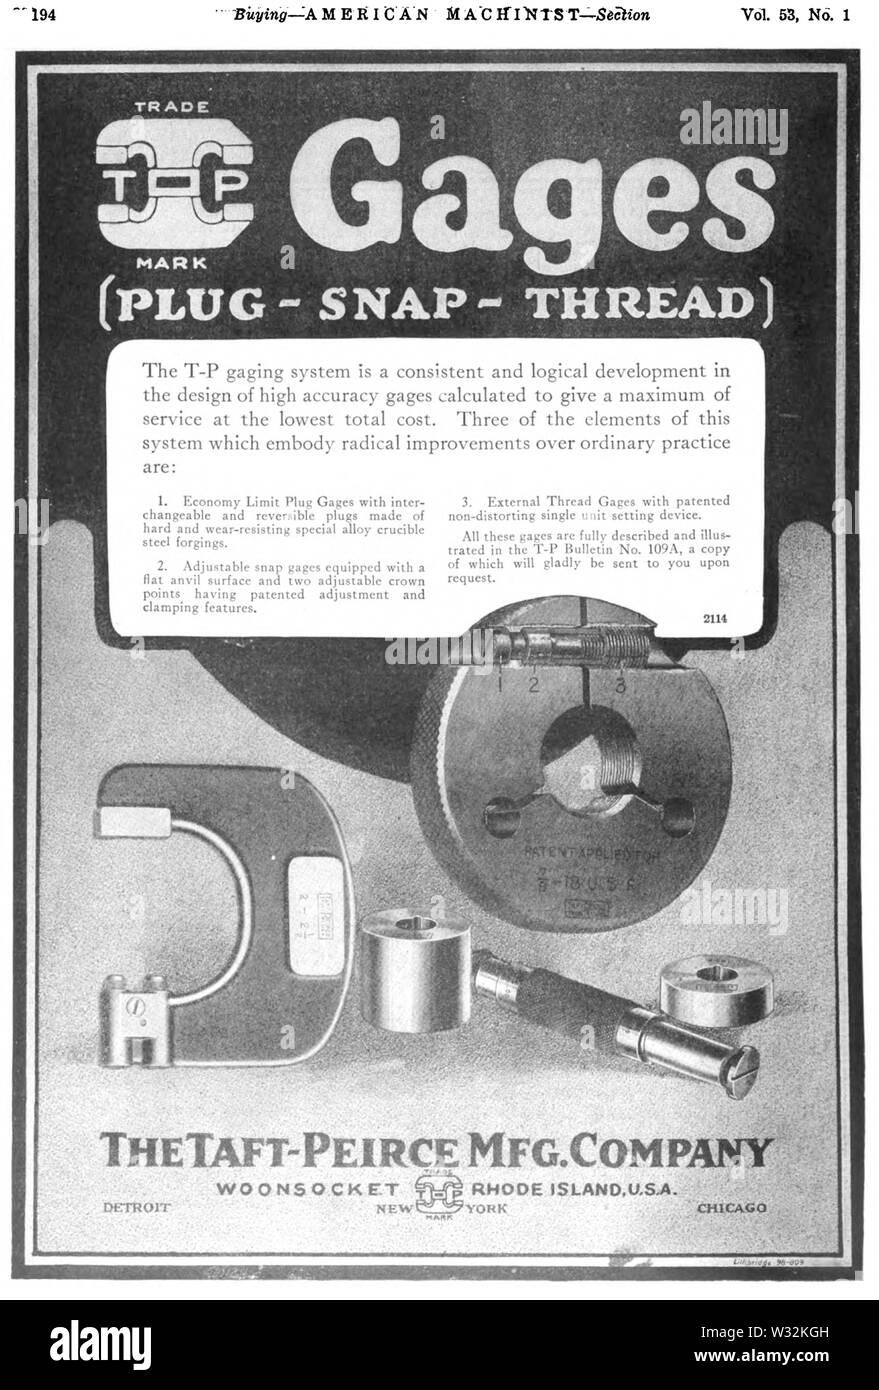 Taft-Peirce gage annuncio in American Machinist 1920 v53 n1 Immagini Stock